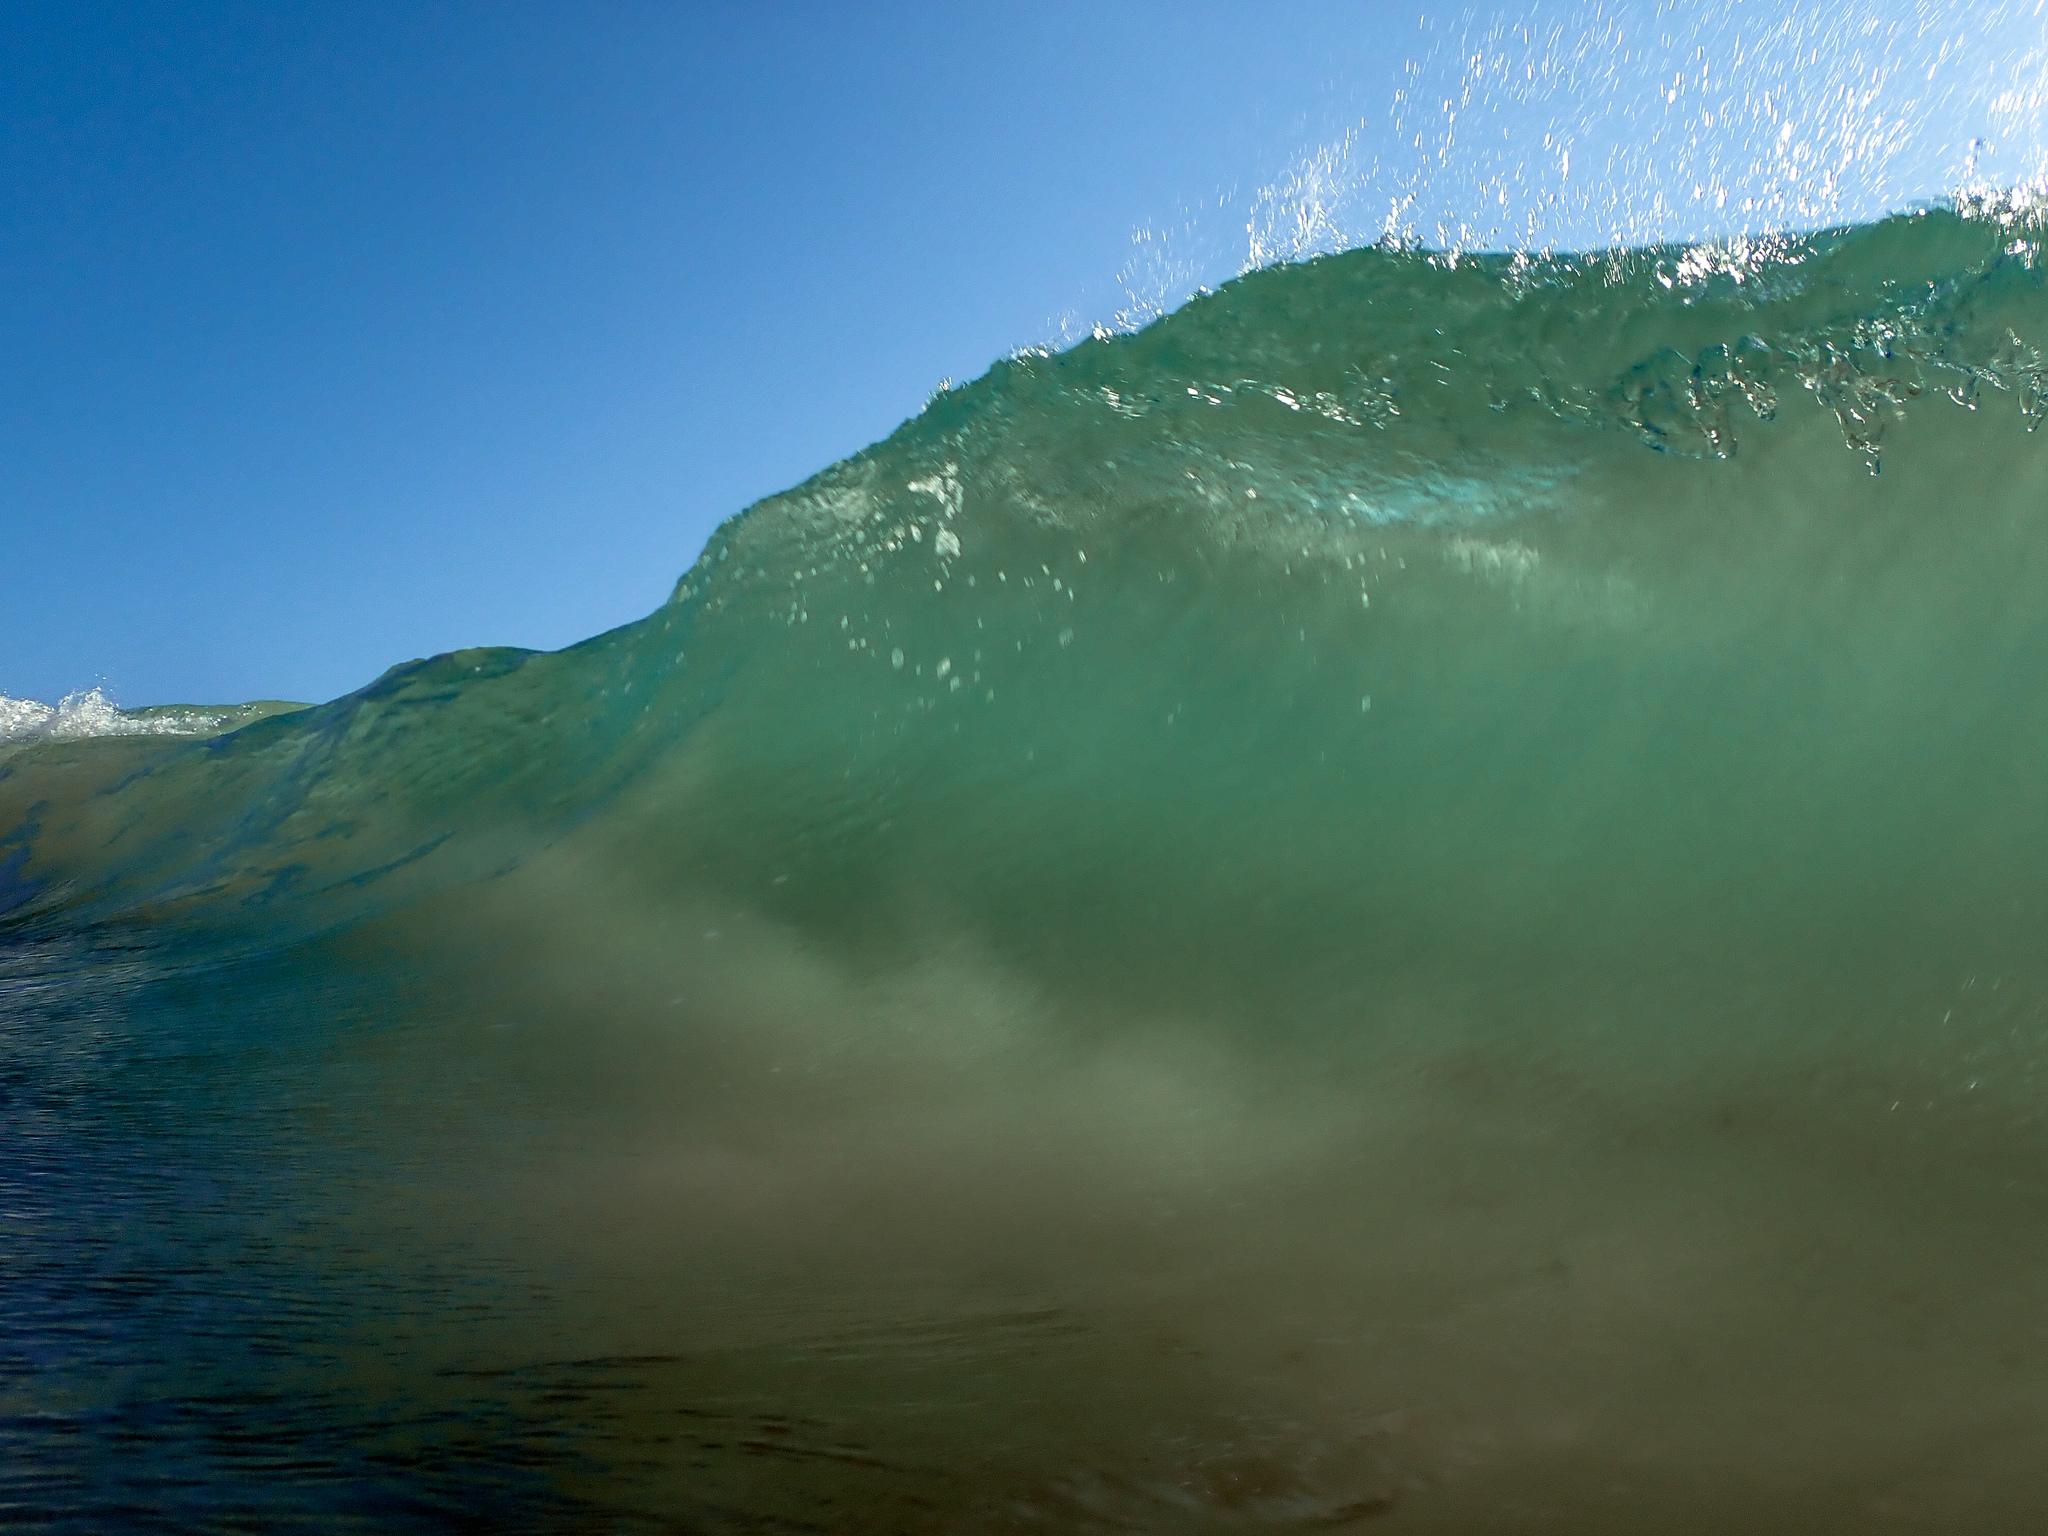 A wave at Tulum Beach, Mexico